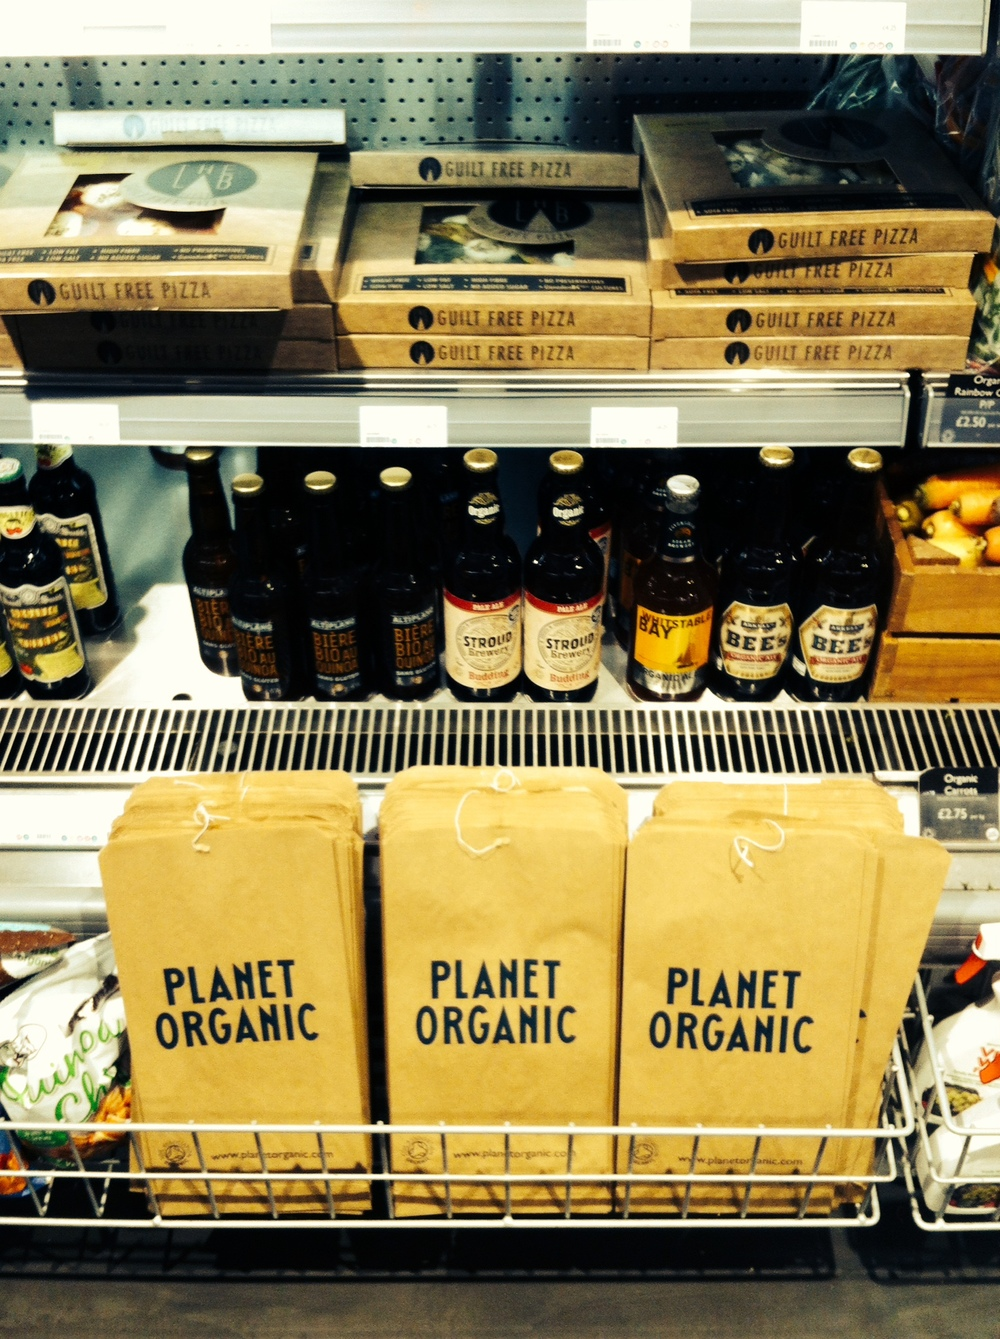 Planet Organic_내부_글루텐프리코너 및 포장.jpeg